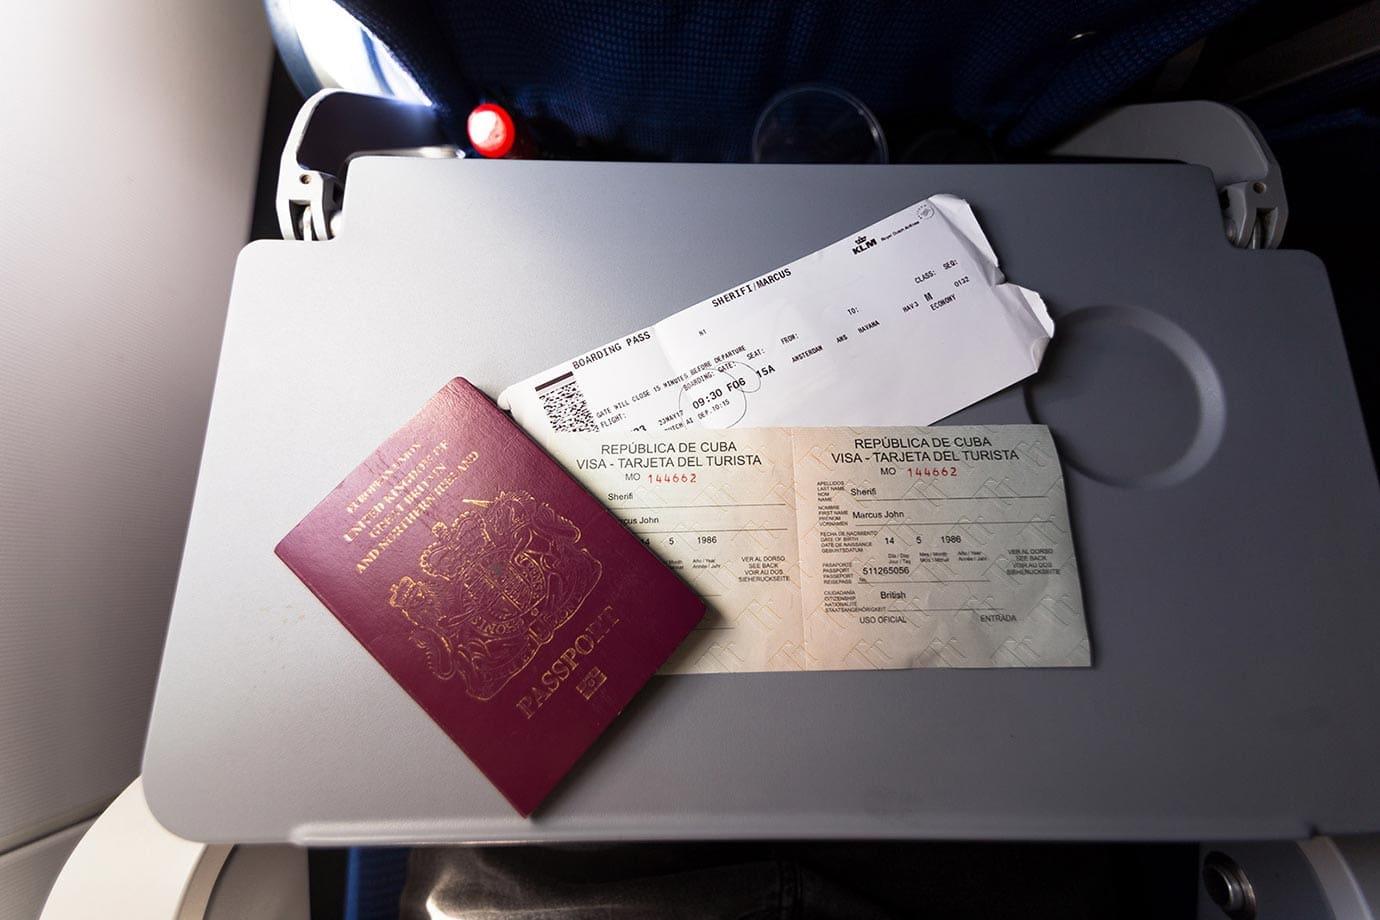 Tourist visa for Cuba